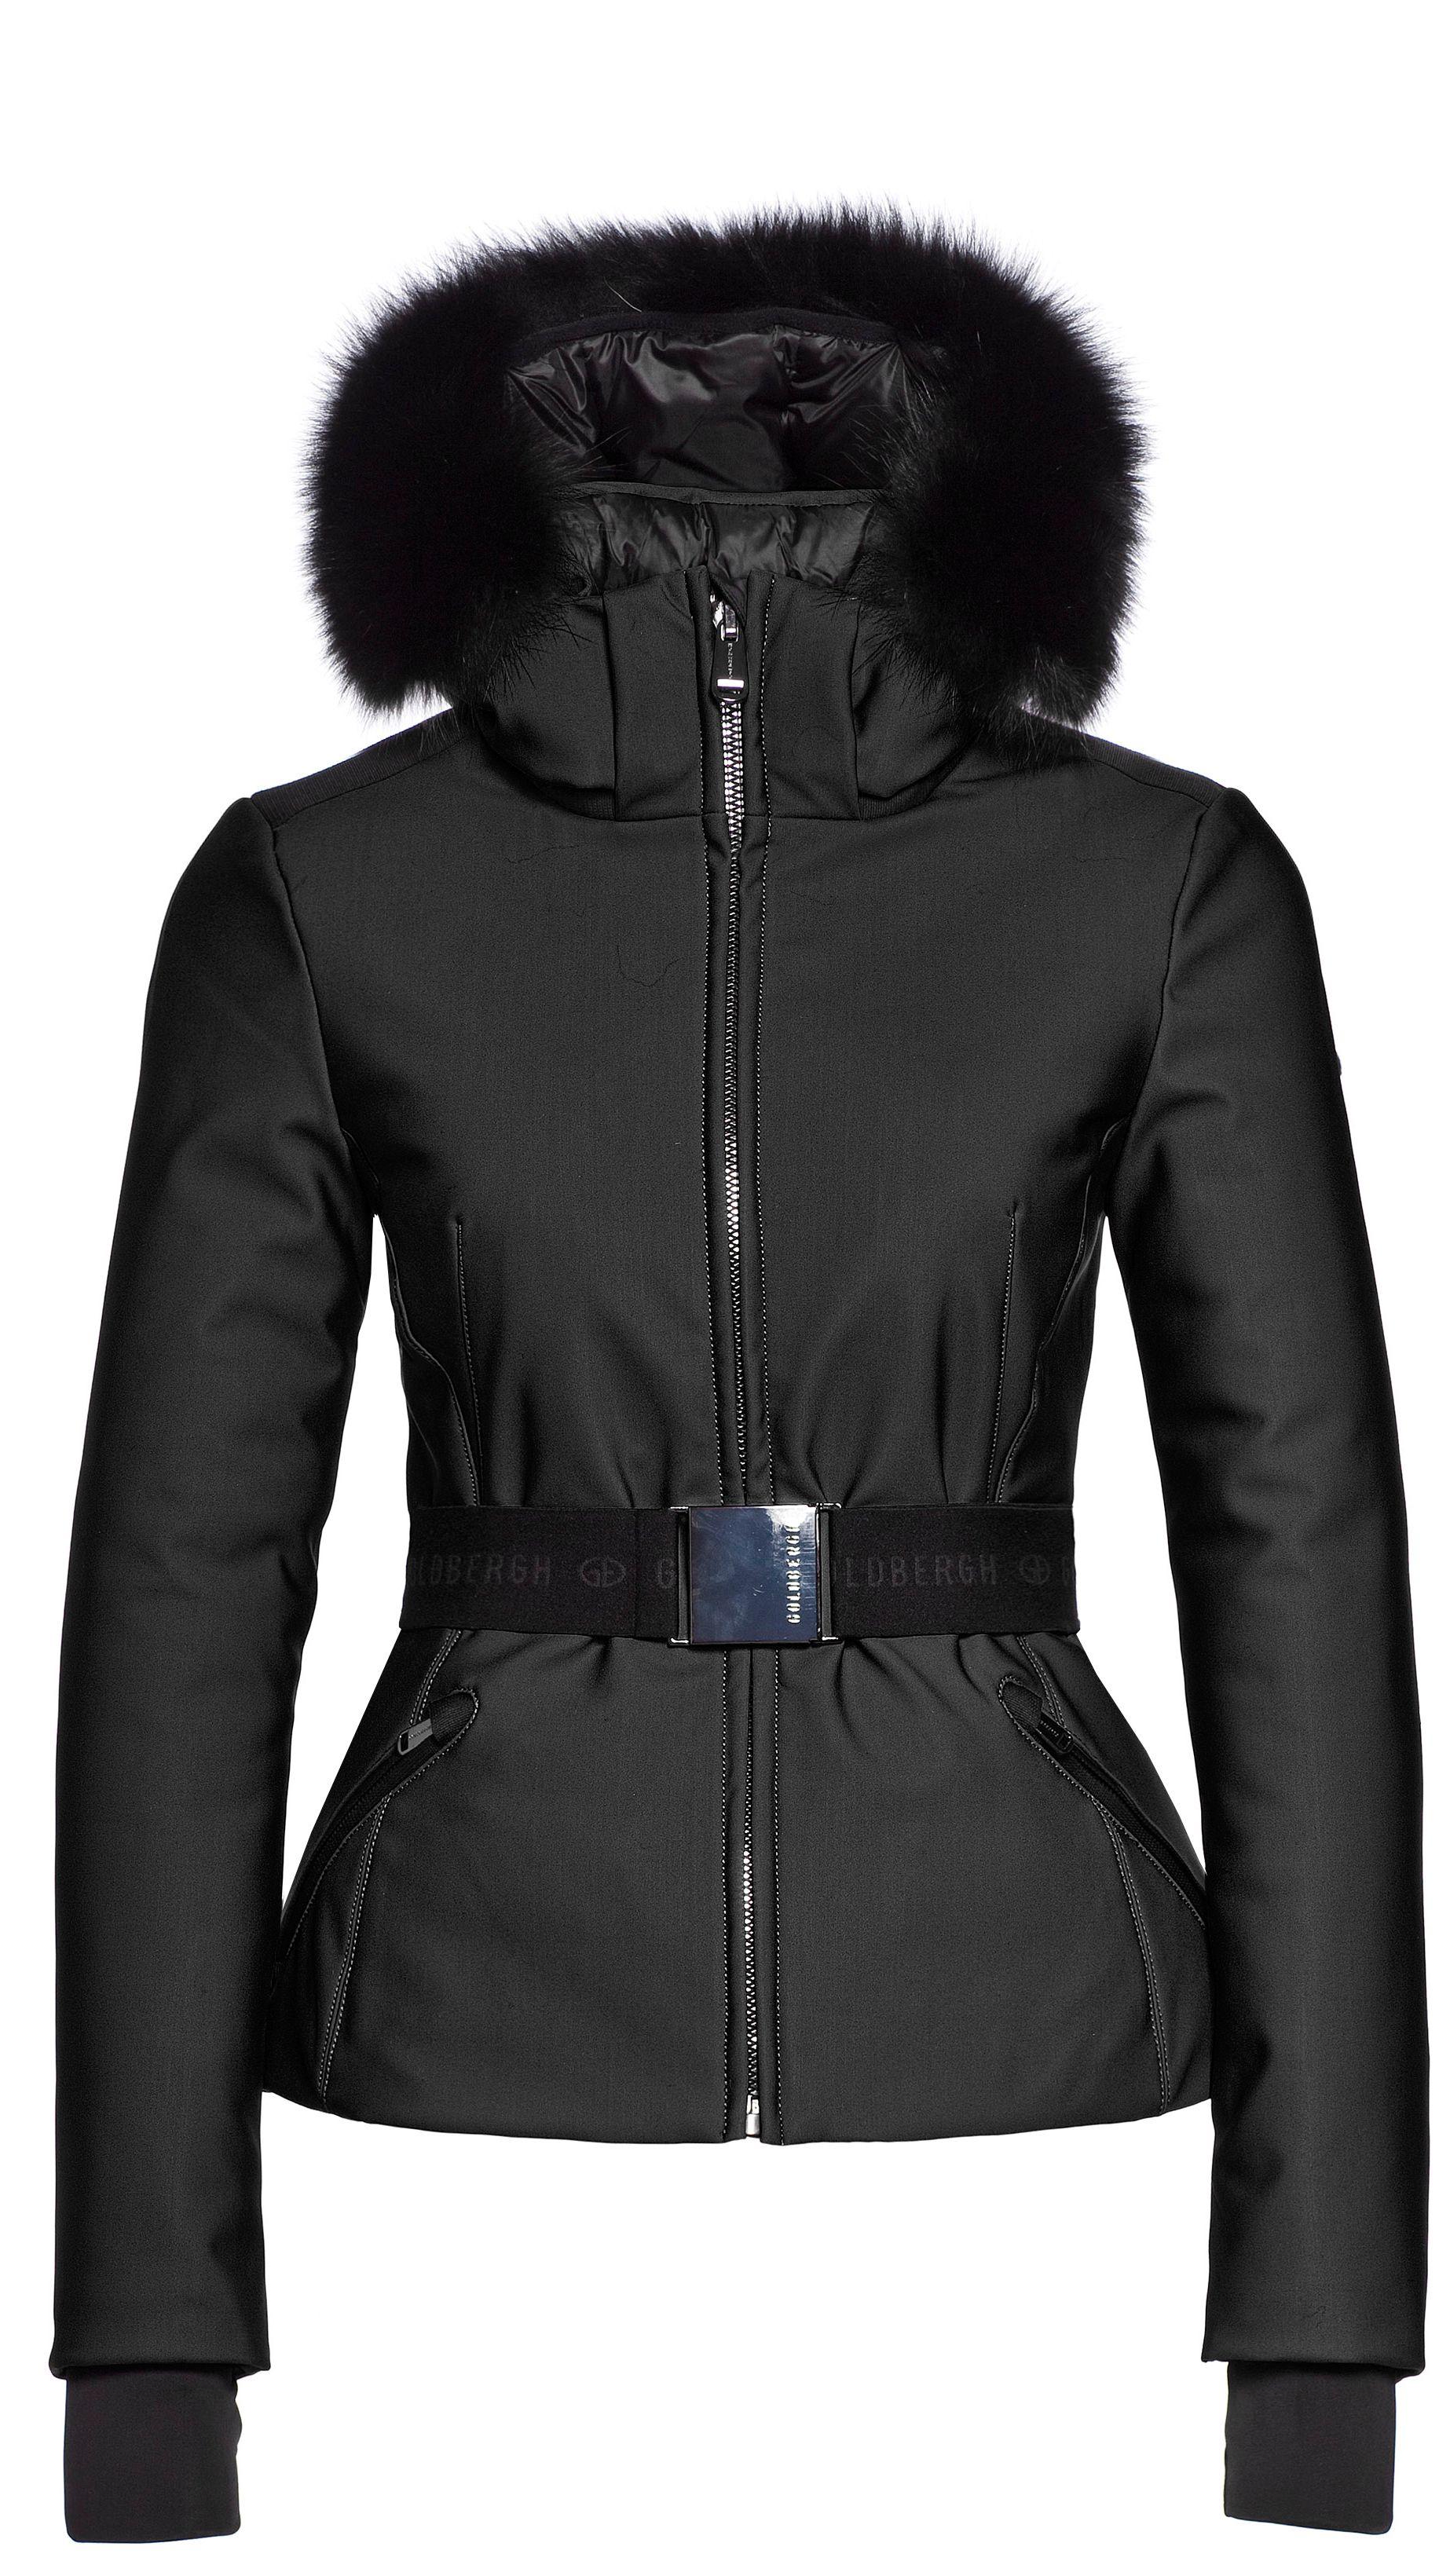 For Ski 2017 Pin From Jackets On Winter Winternational 18 Black MUVqSpGz